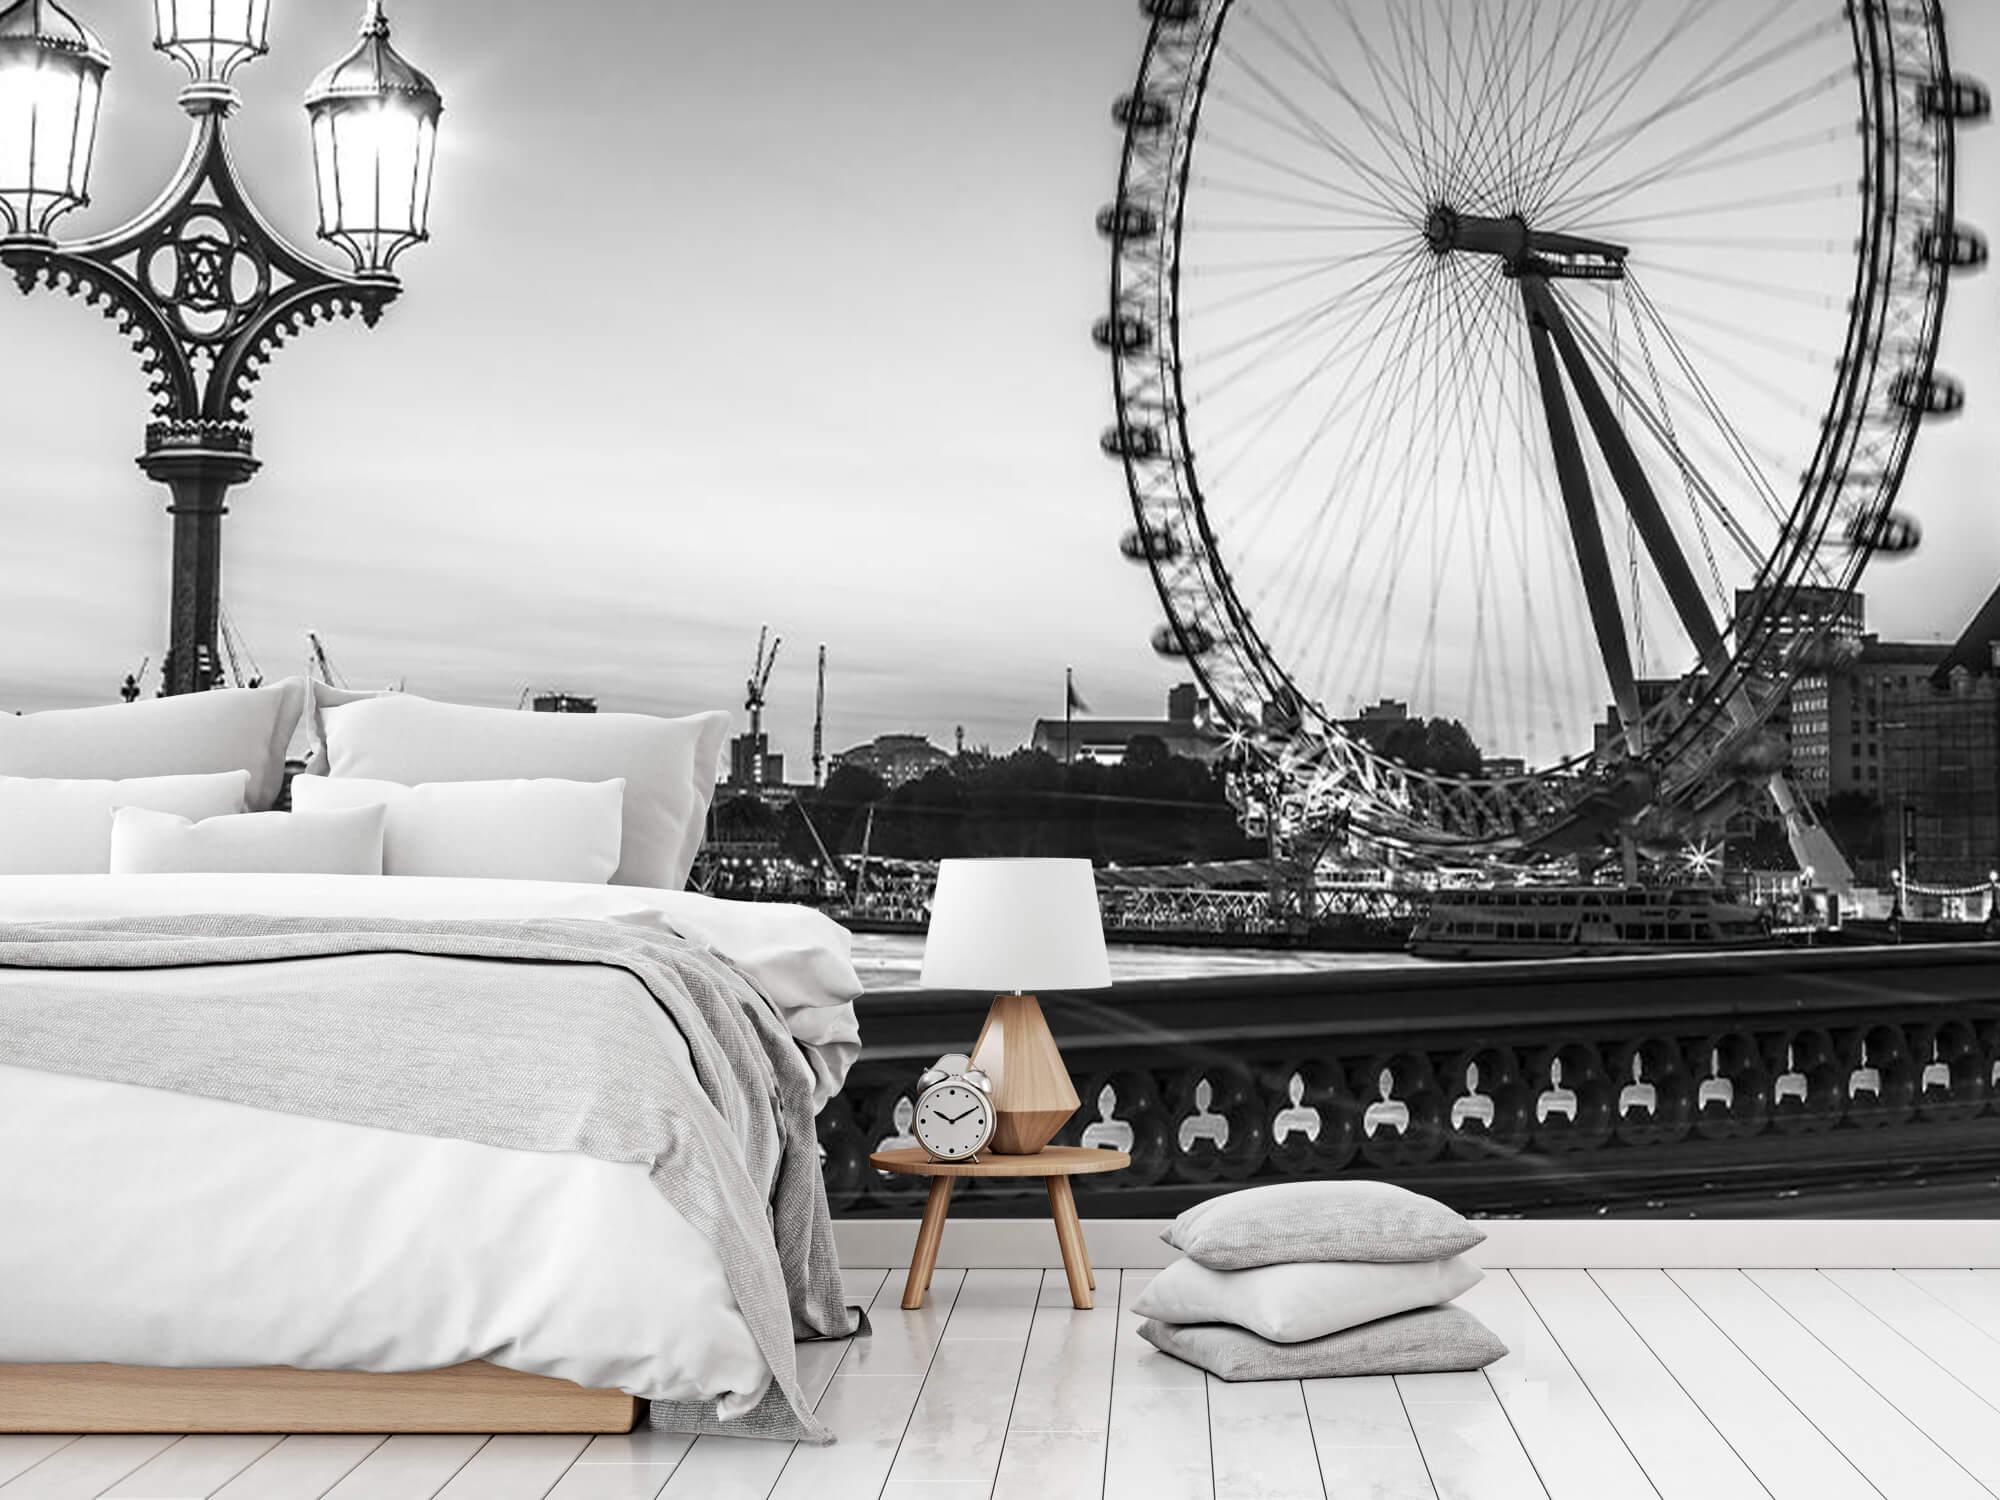 Ferris wheel black and white 8